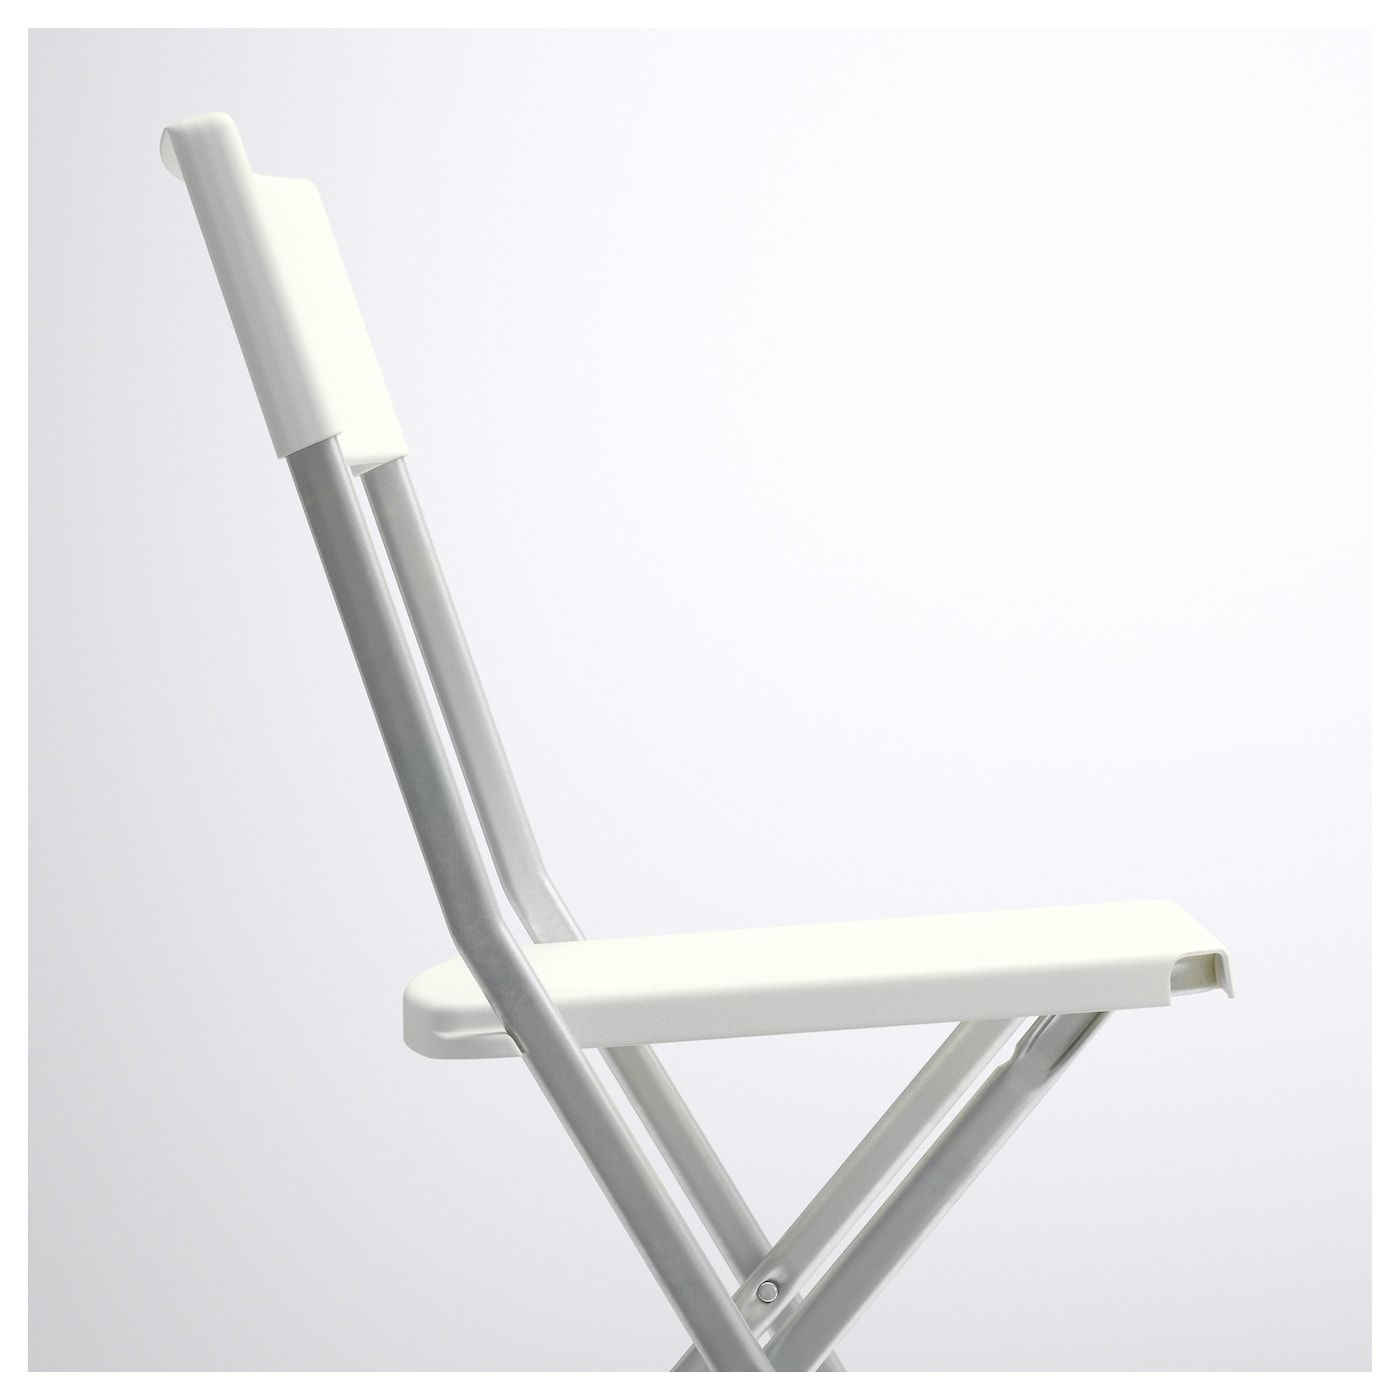 Gunde Folding Chair White Folding Chair Ikea Hanging Chair